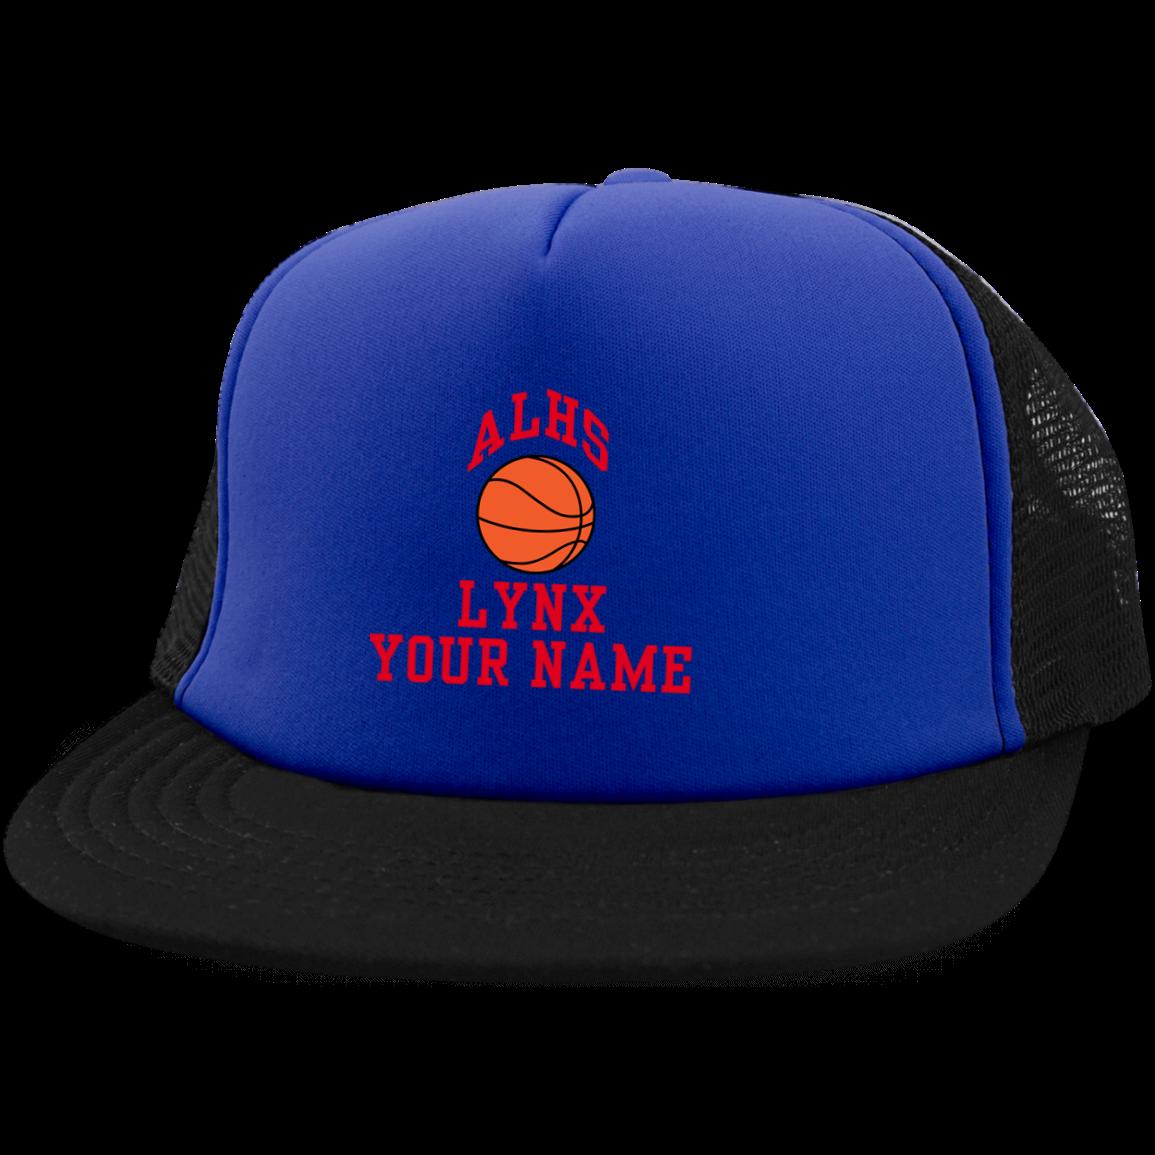 9b5f2686382 Abraham Lincoln High School Trucker Hat with Snapback - Jostens ...